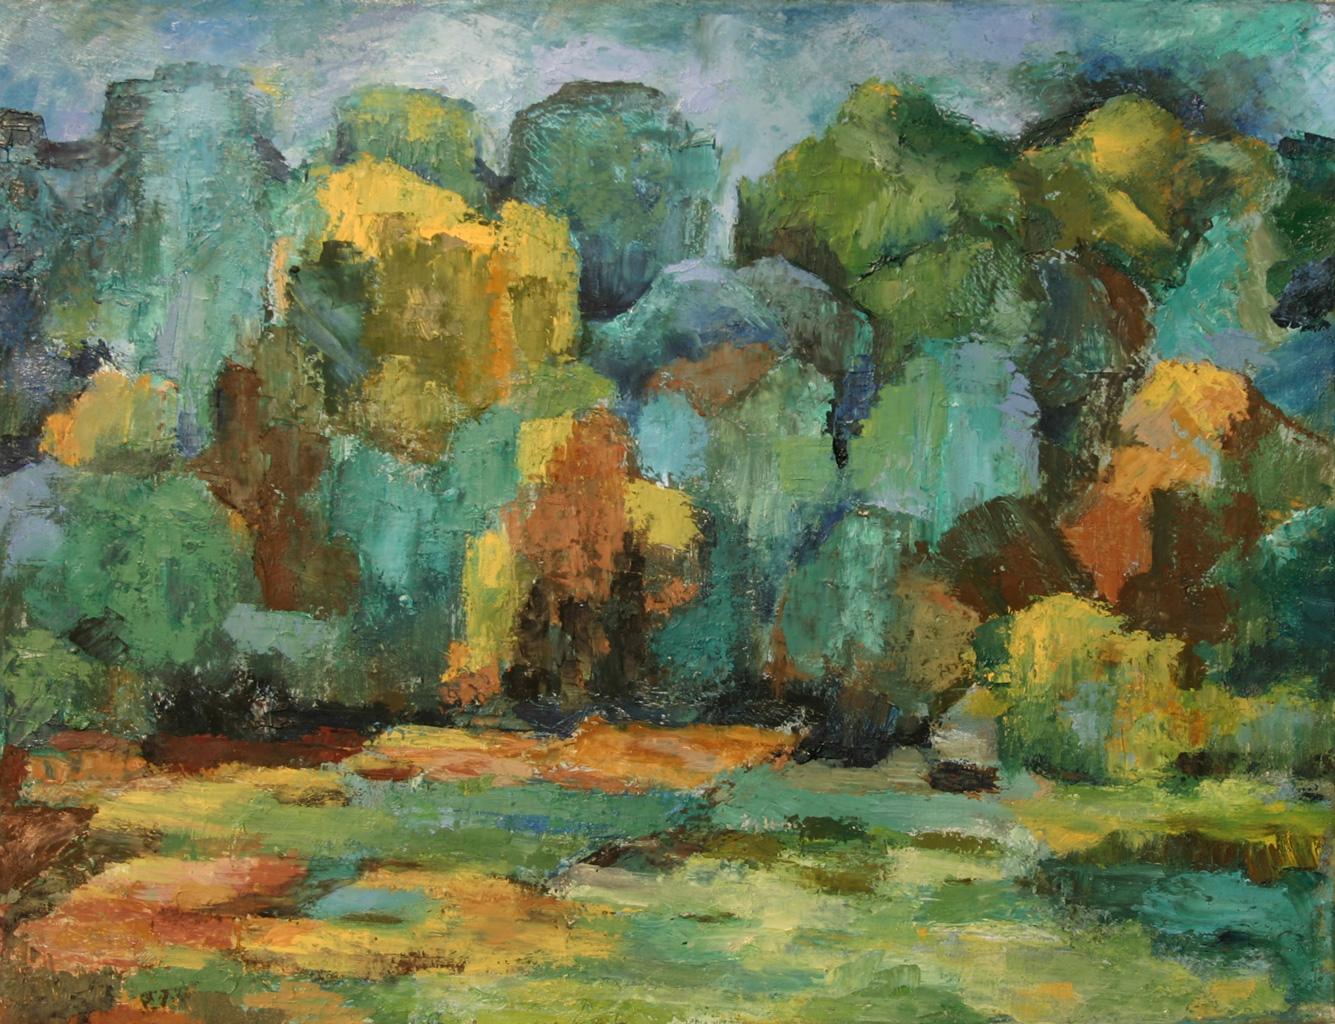 Bucher Wald, Öl auf Leinwand, 50 x 65 cm, 1998